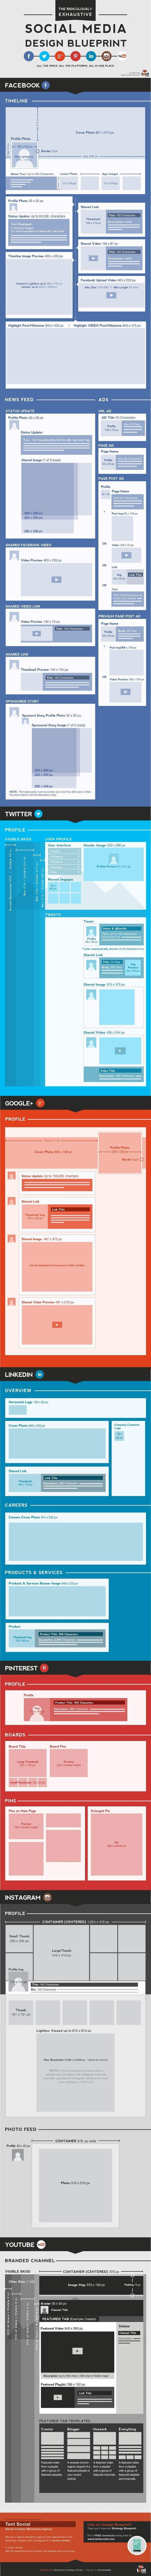 #SocialMedia Design Blueprint, very useful!